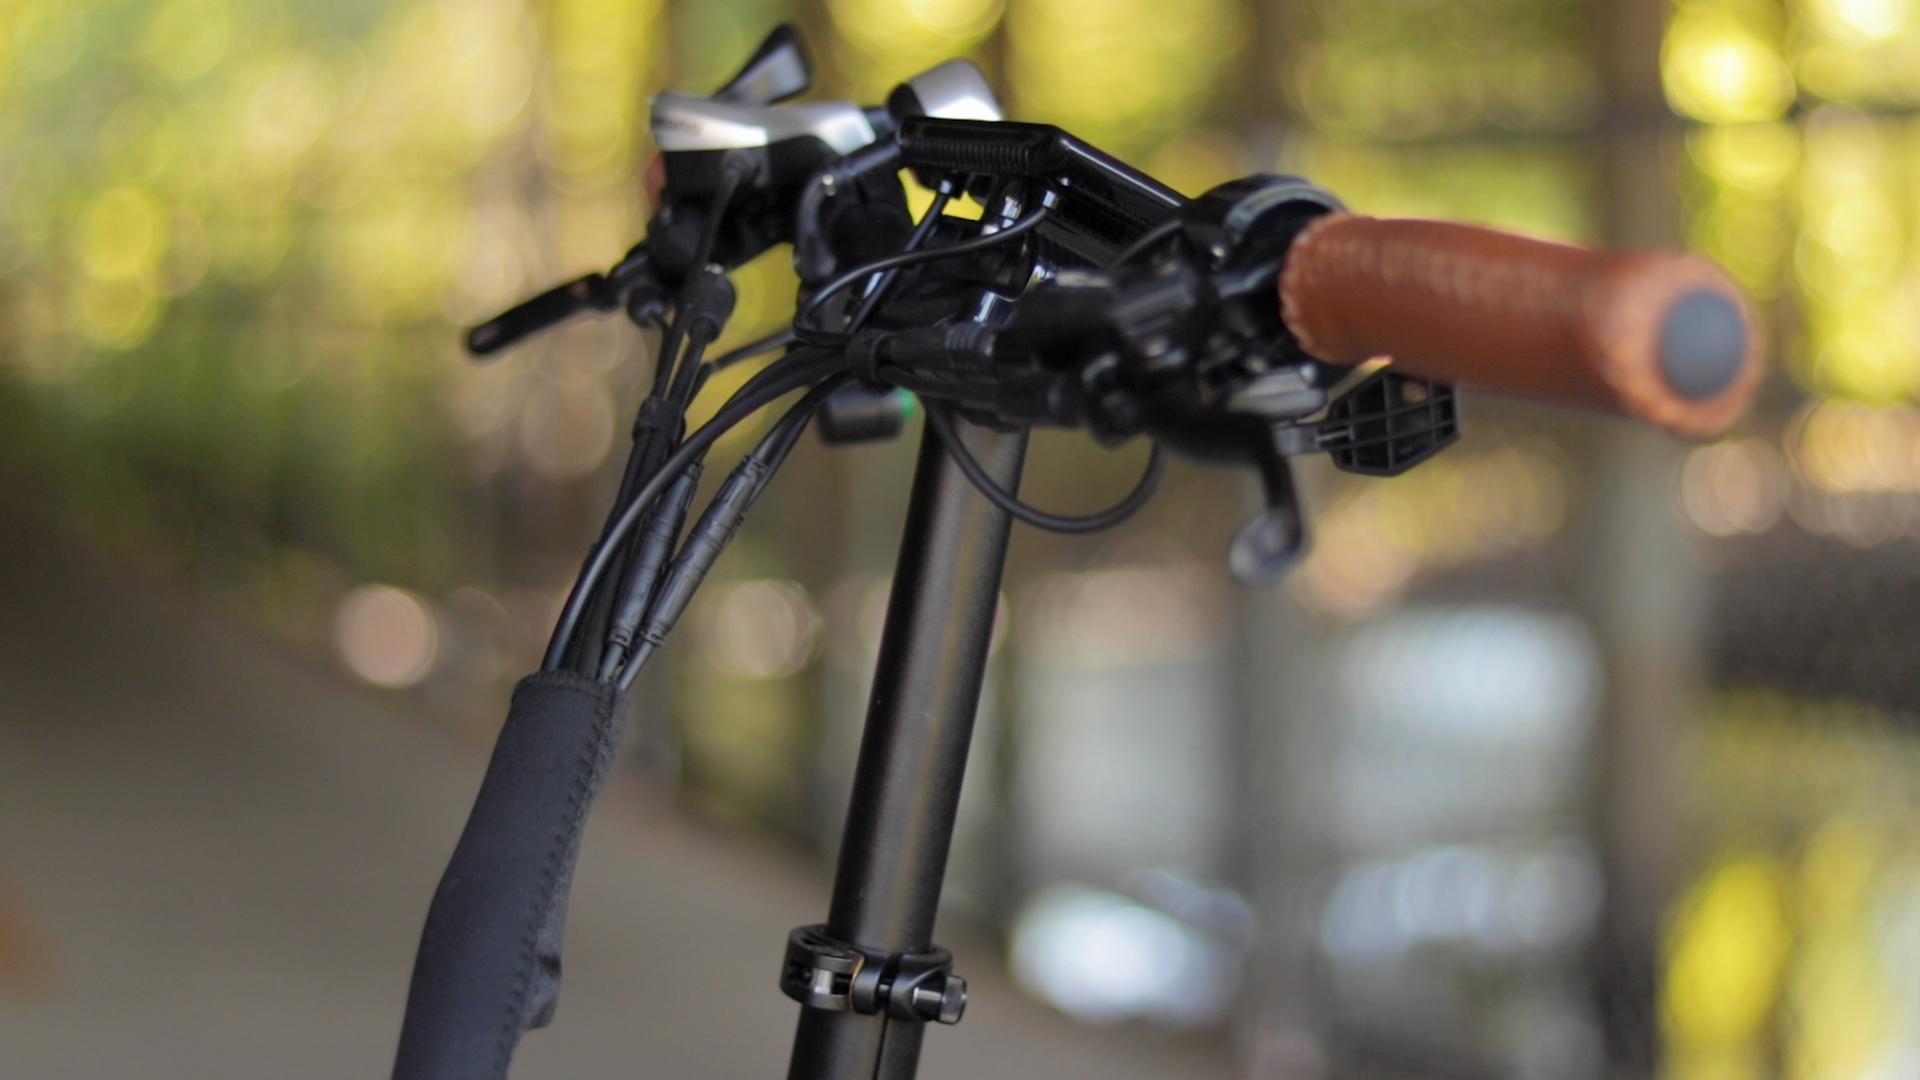 electrified-reviews-bagibike-b10-foldign-electric-bike-review-grip.jpg